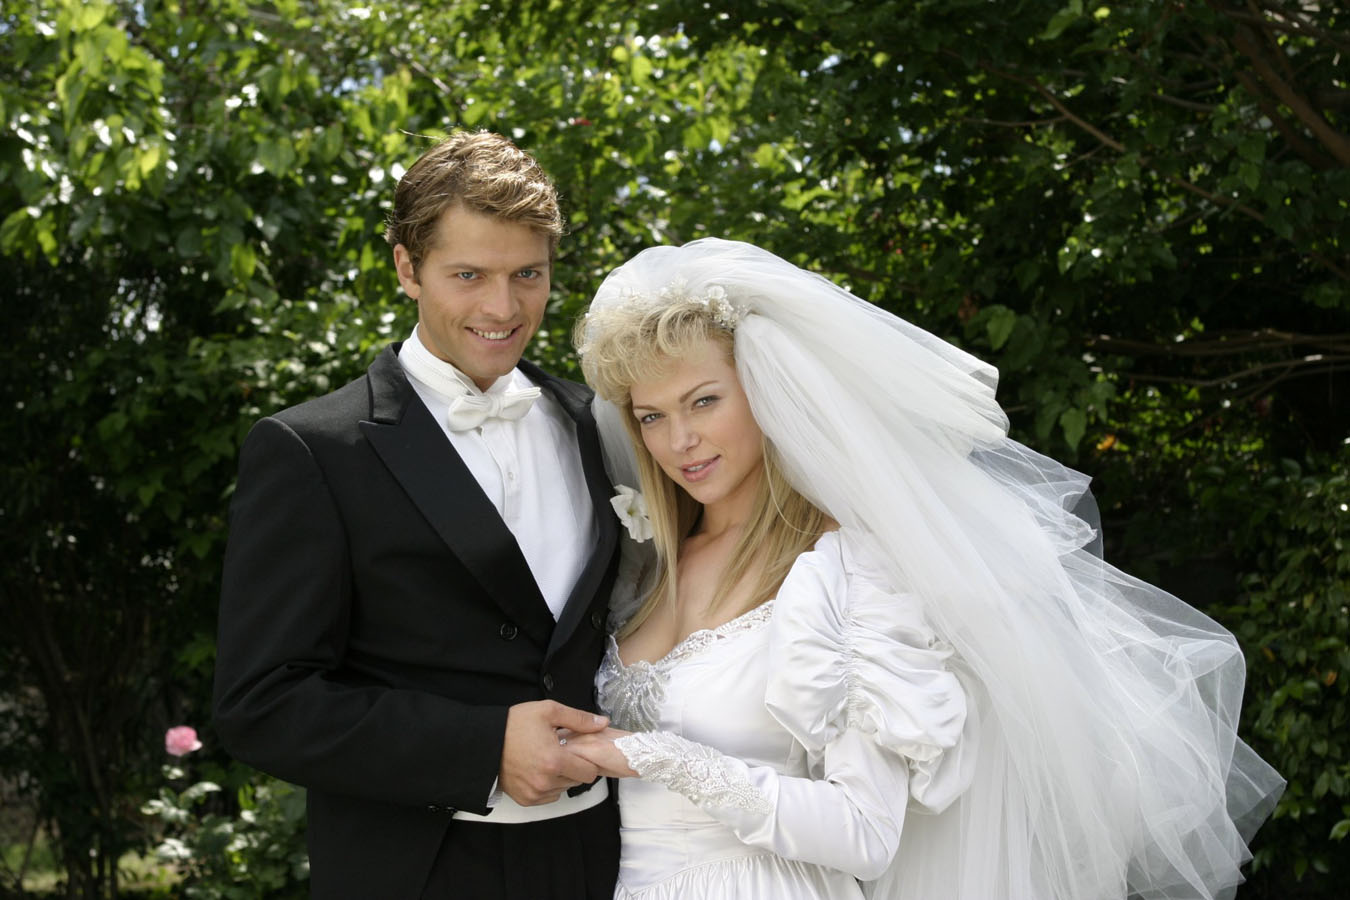 The perfect married couple - Paul Bernardo (Misha Collins) and Karla Homolka (Laura Prepon) in Karla (2006)